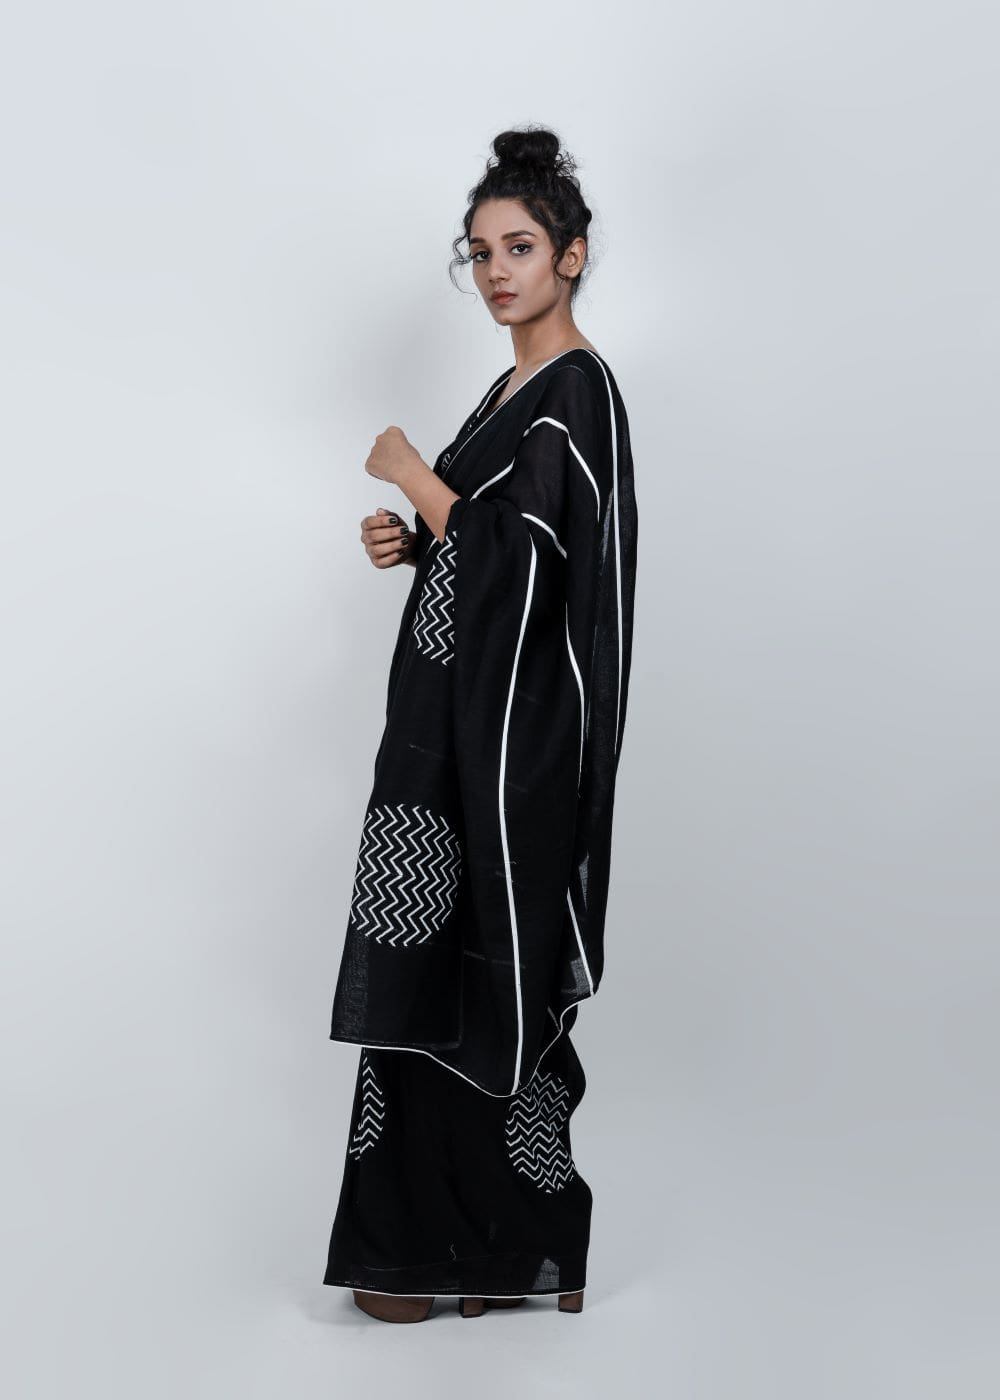 STOREAT44   Best Black & White Clothing Brand   2